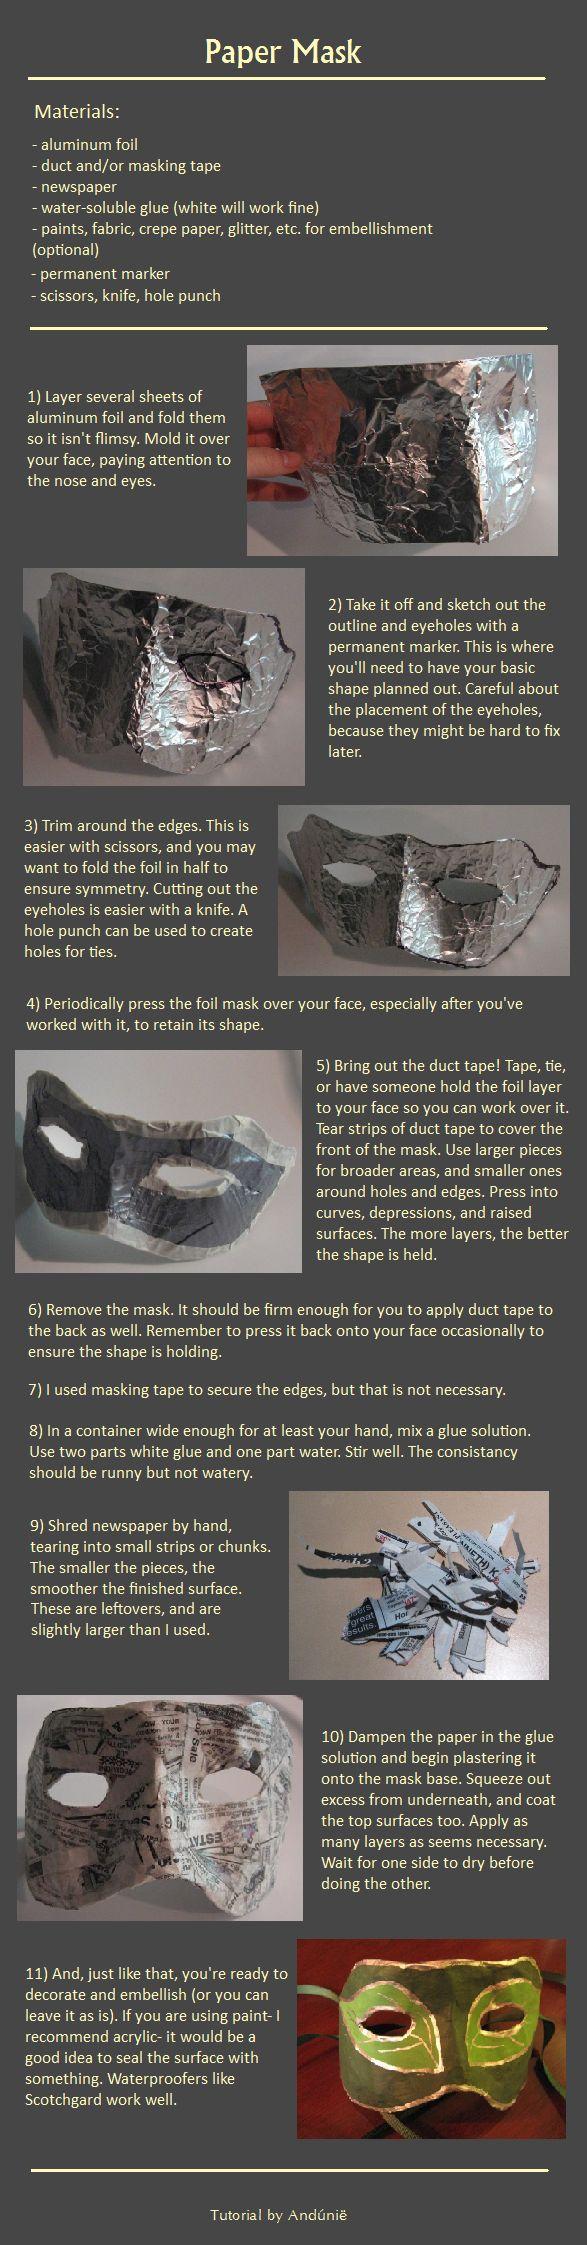 Mask Tutorial by Andunie on deviantART